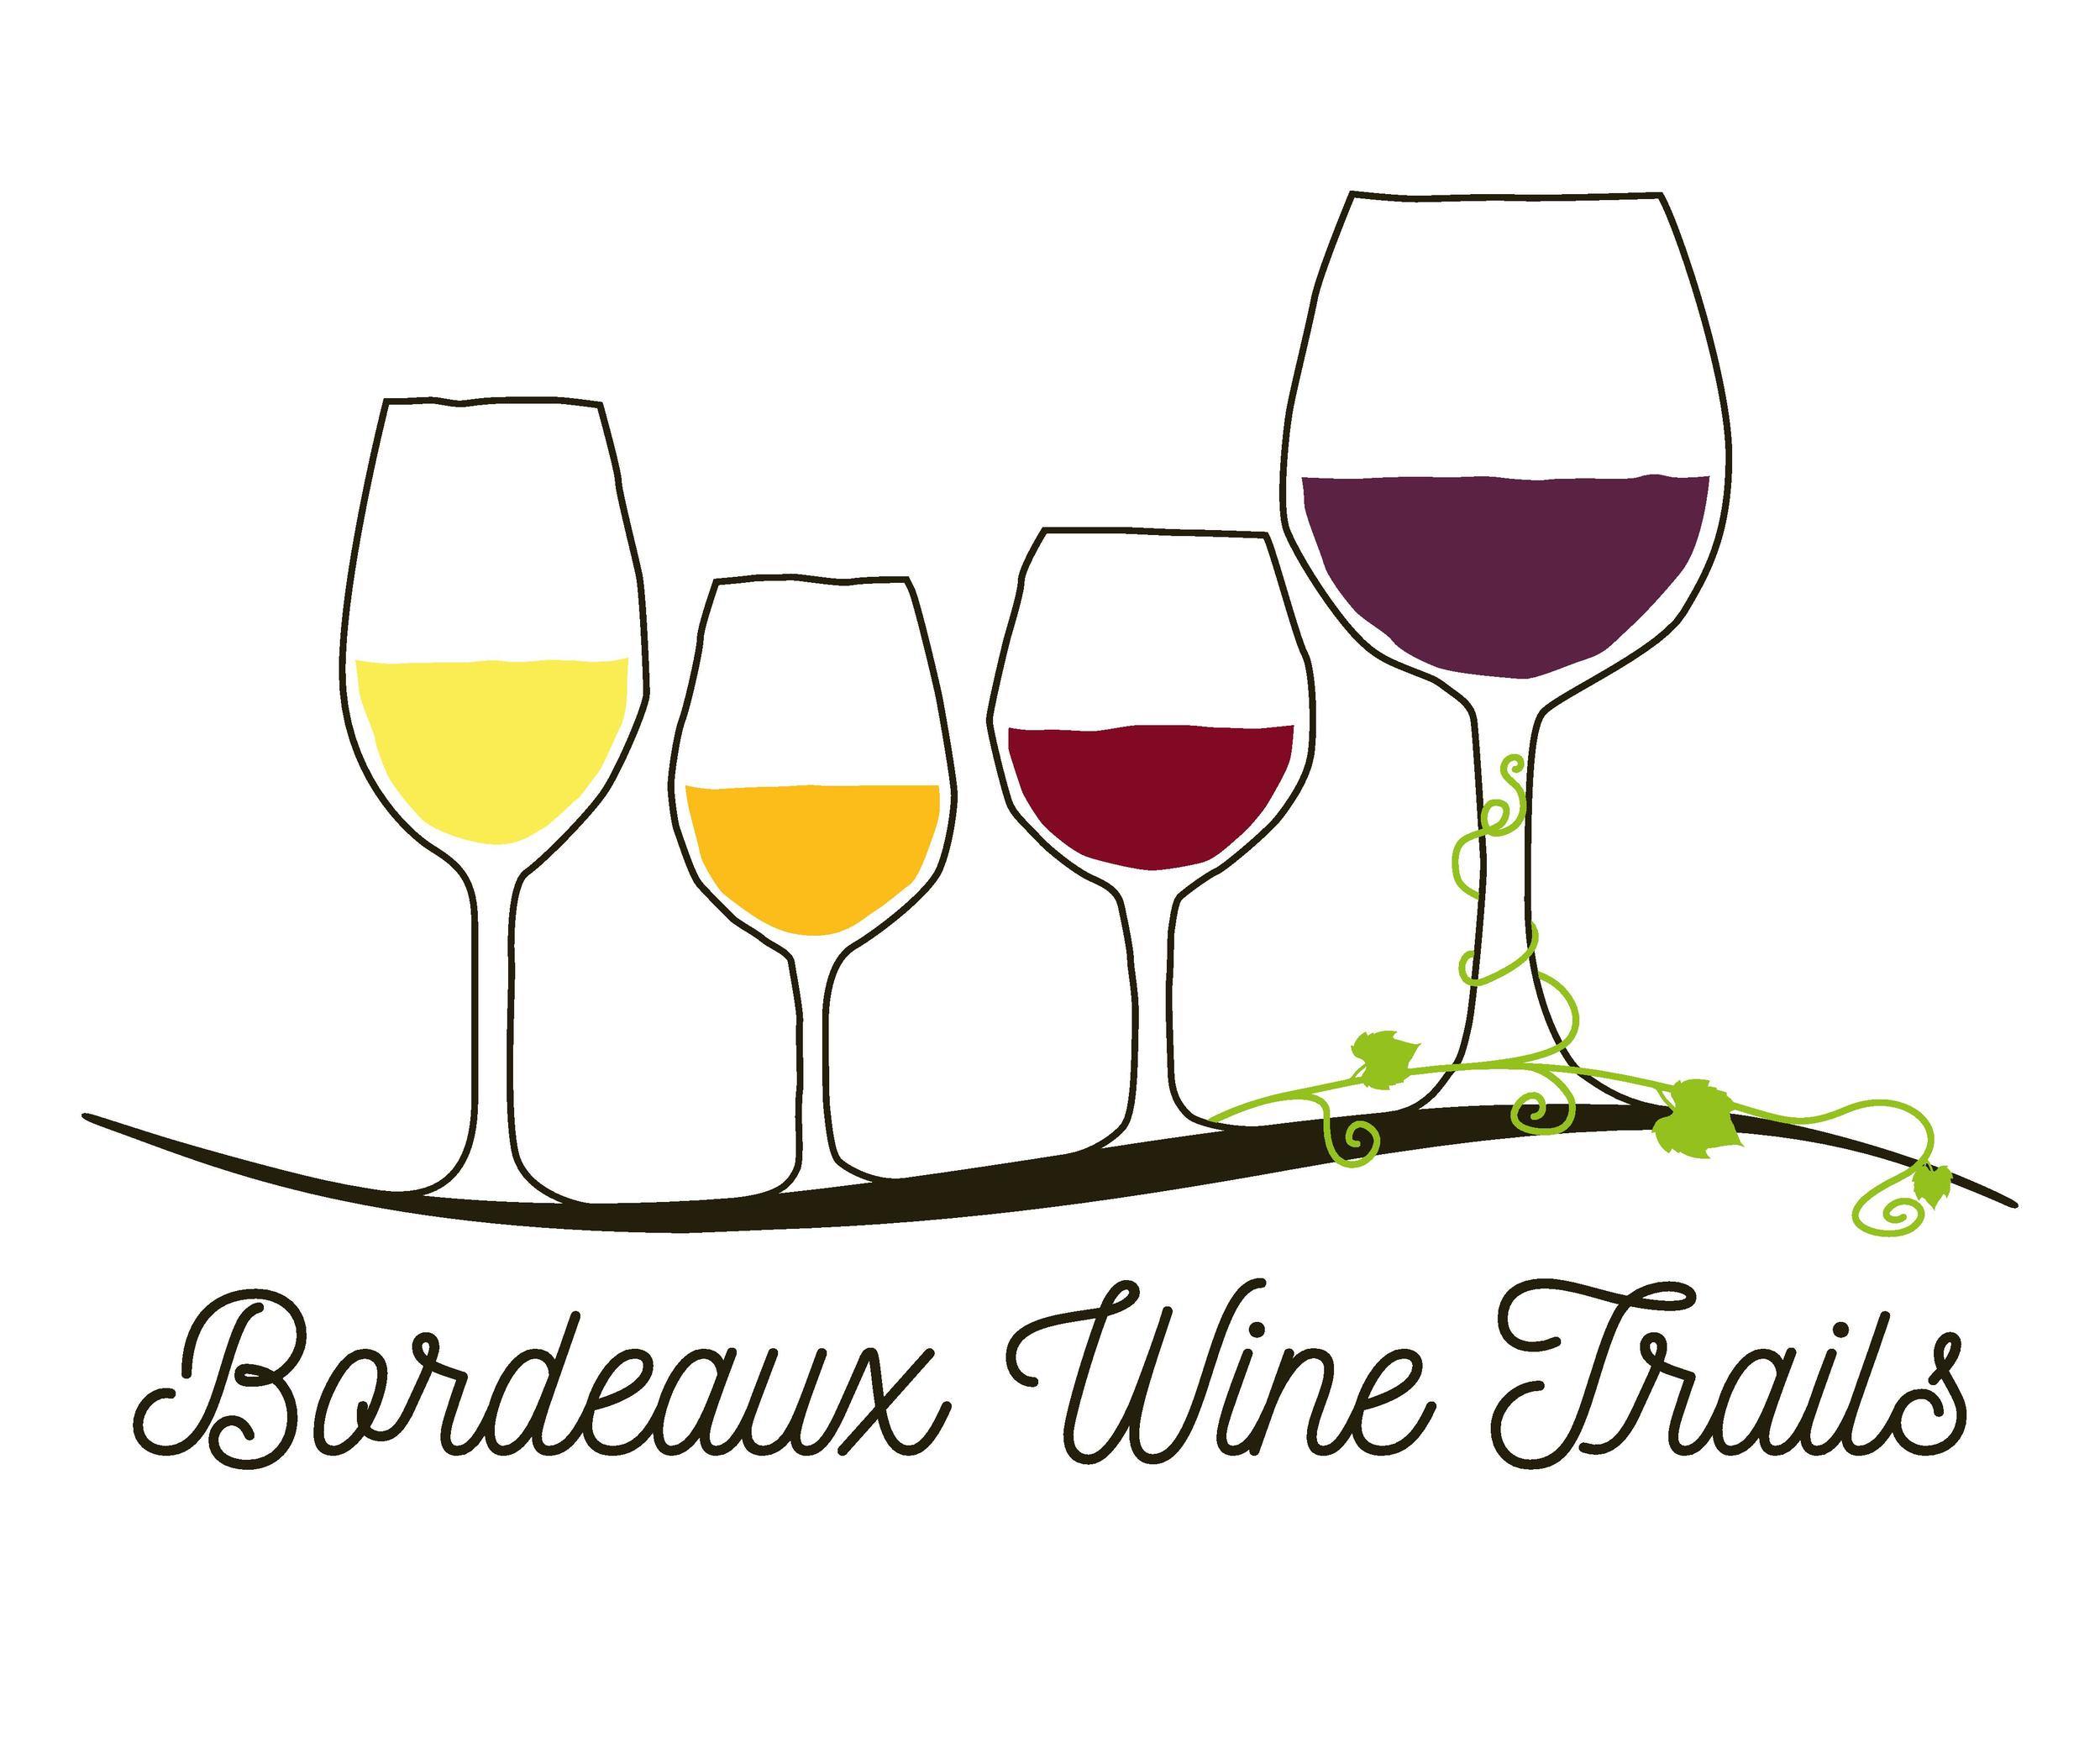 Bx Wine Trails logo.jpg